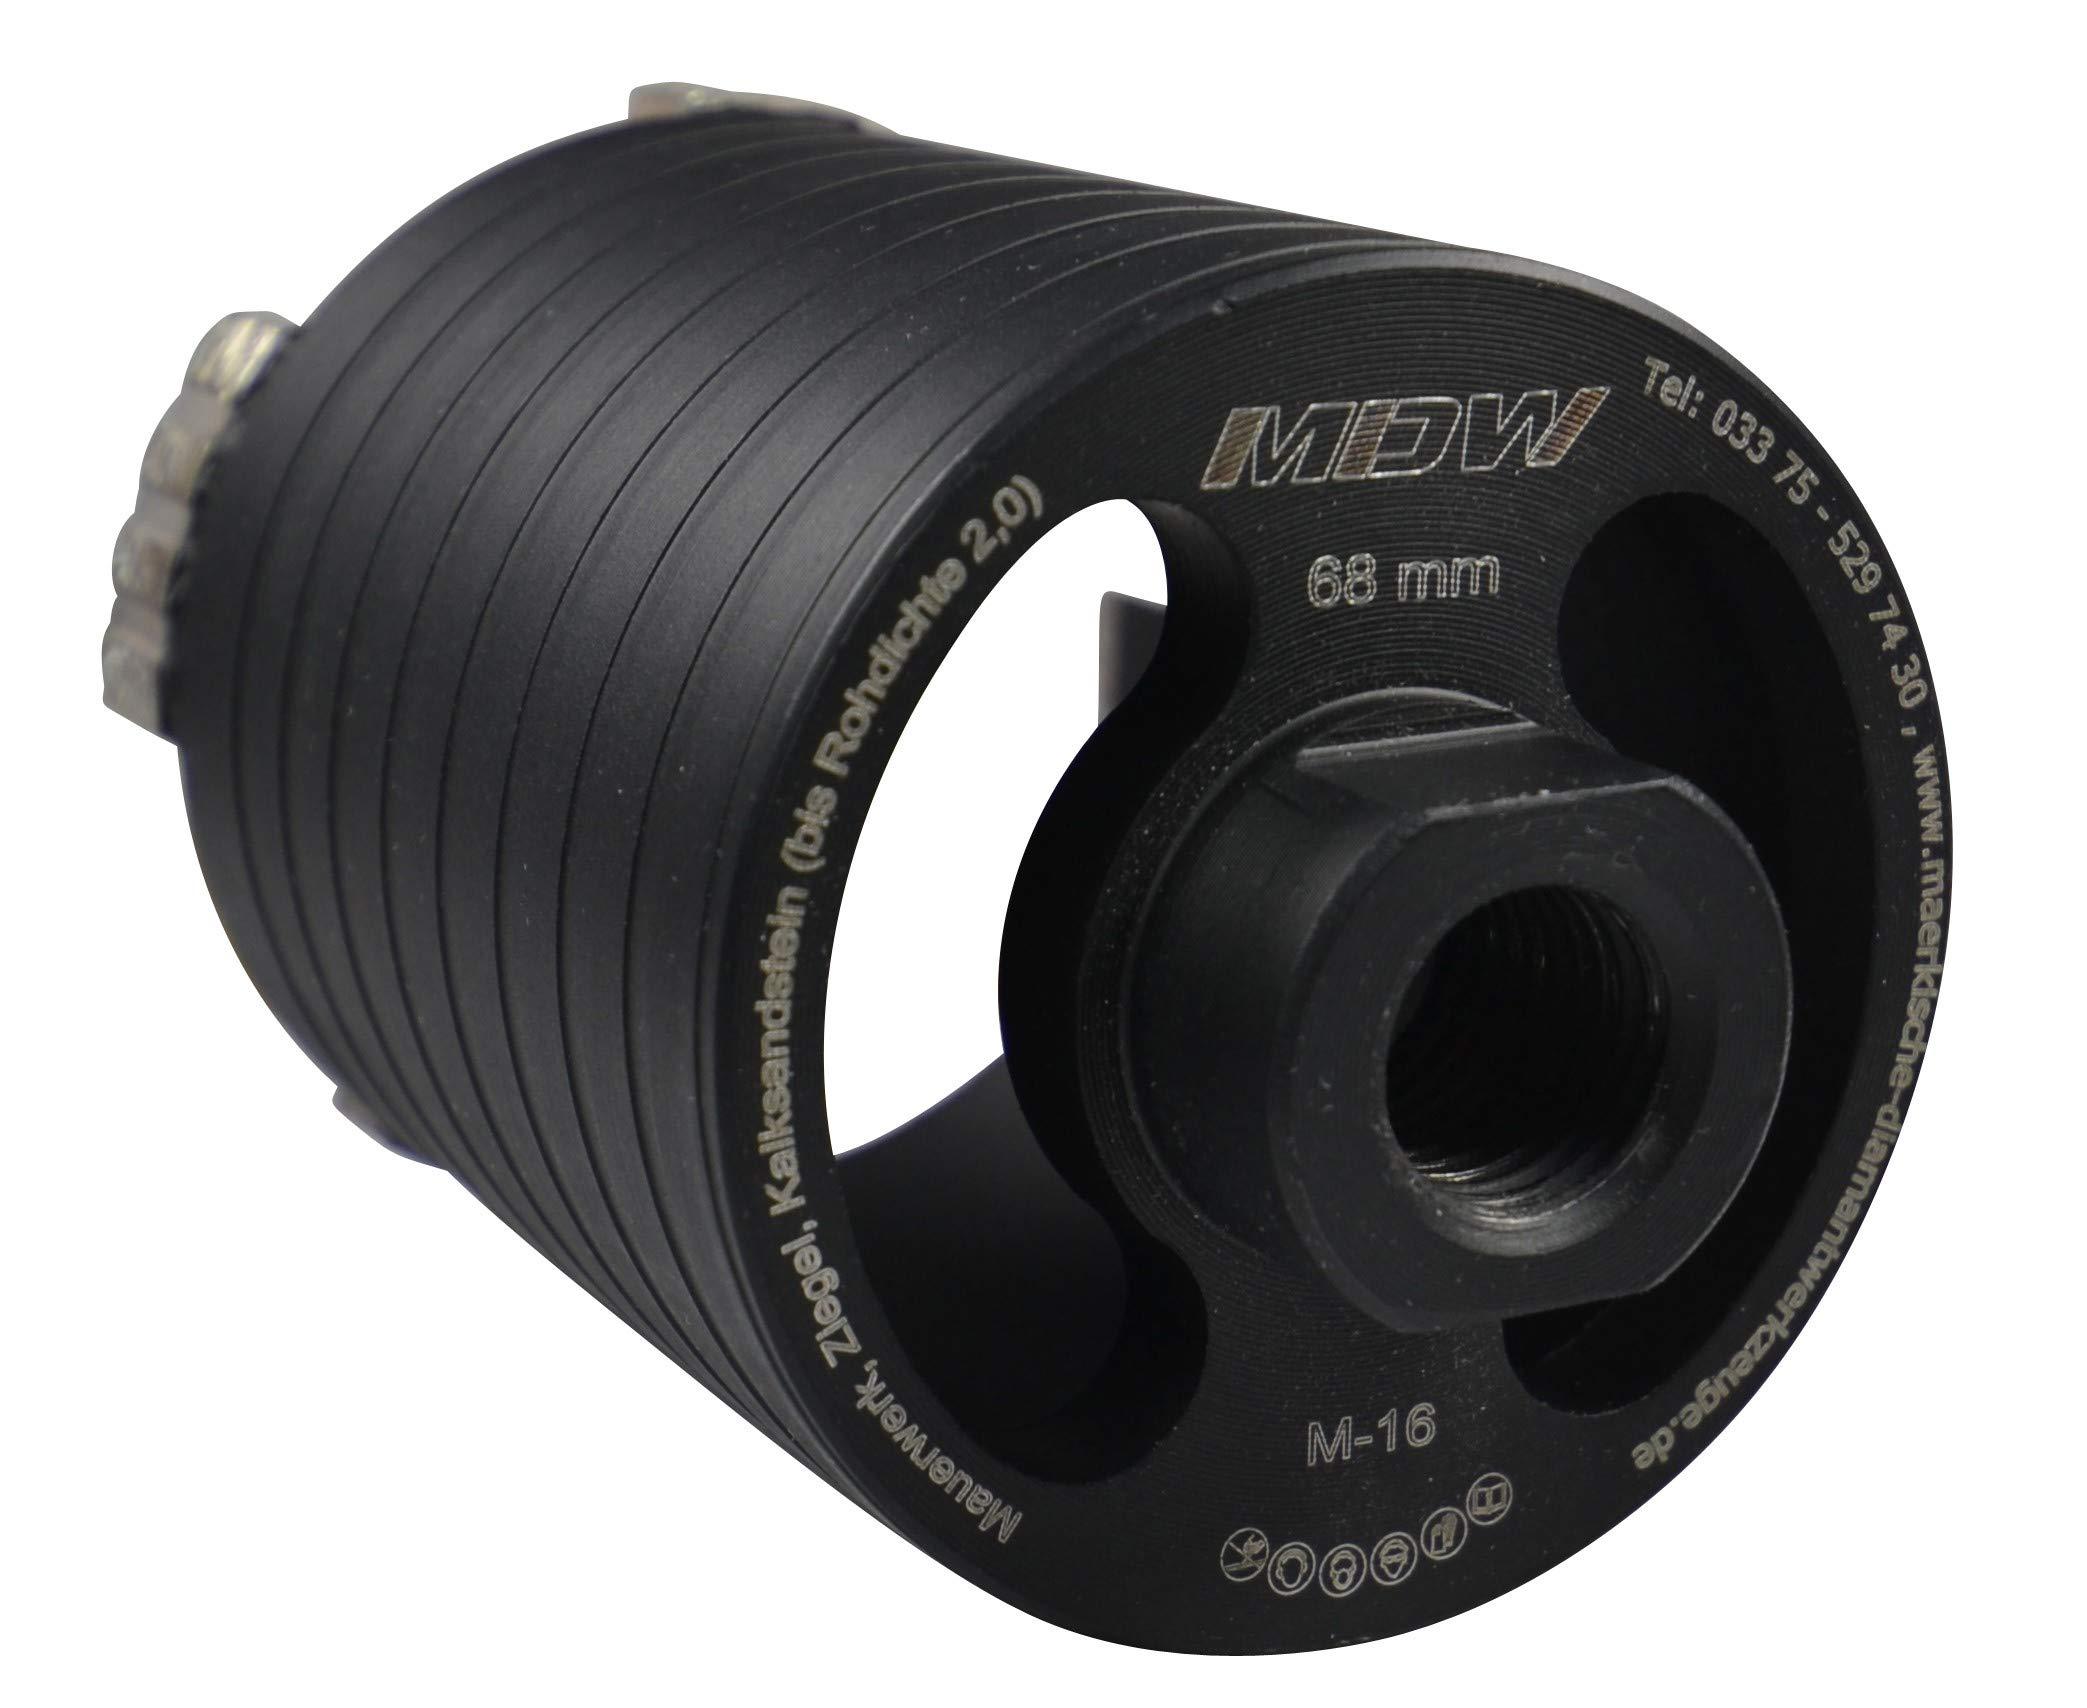 Diamant-Trocken-Kernbohrmaschine-EHD-1500-inklusive-Staubabsaugung-Diamant-Dosensenker-Laser-Black-Turbo